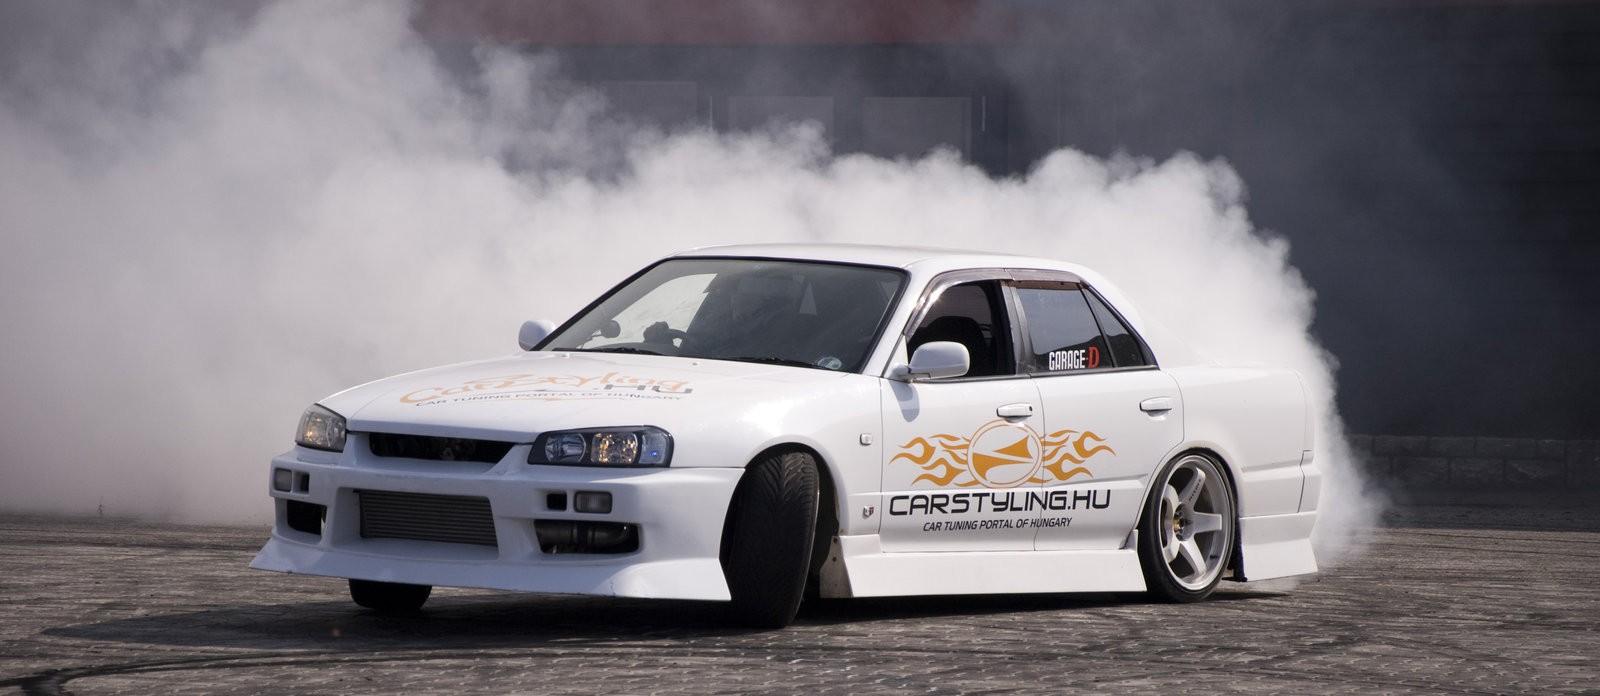 Drifting cars wallpaper wallpapersafari - Drift car wallpaper ...